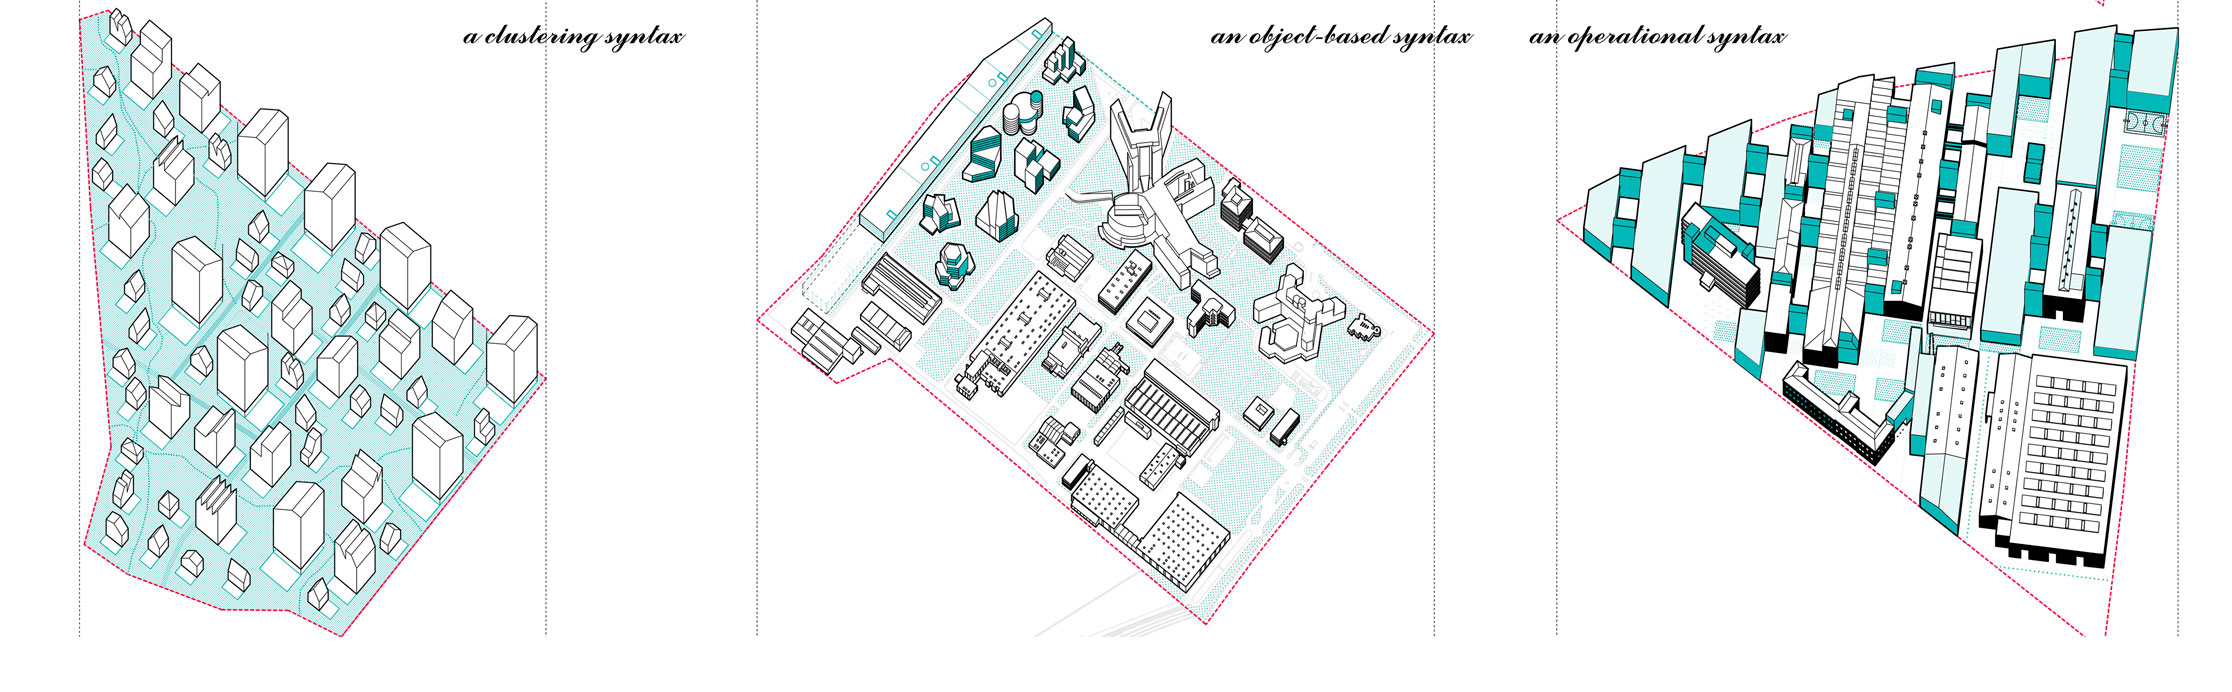 Arenas basabe palacios urban software siemensckersupportsweb malvernweather Choice Image